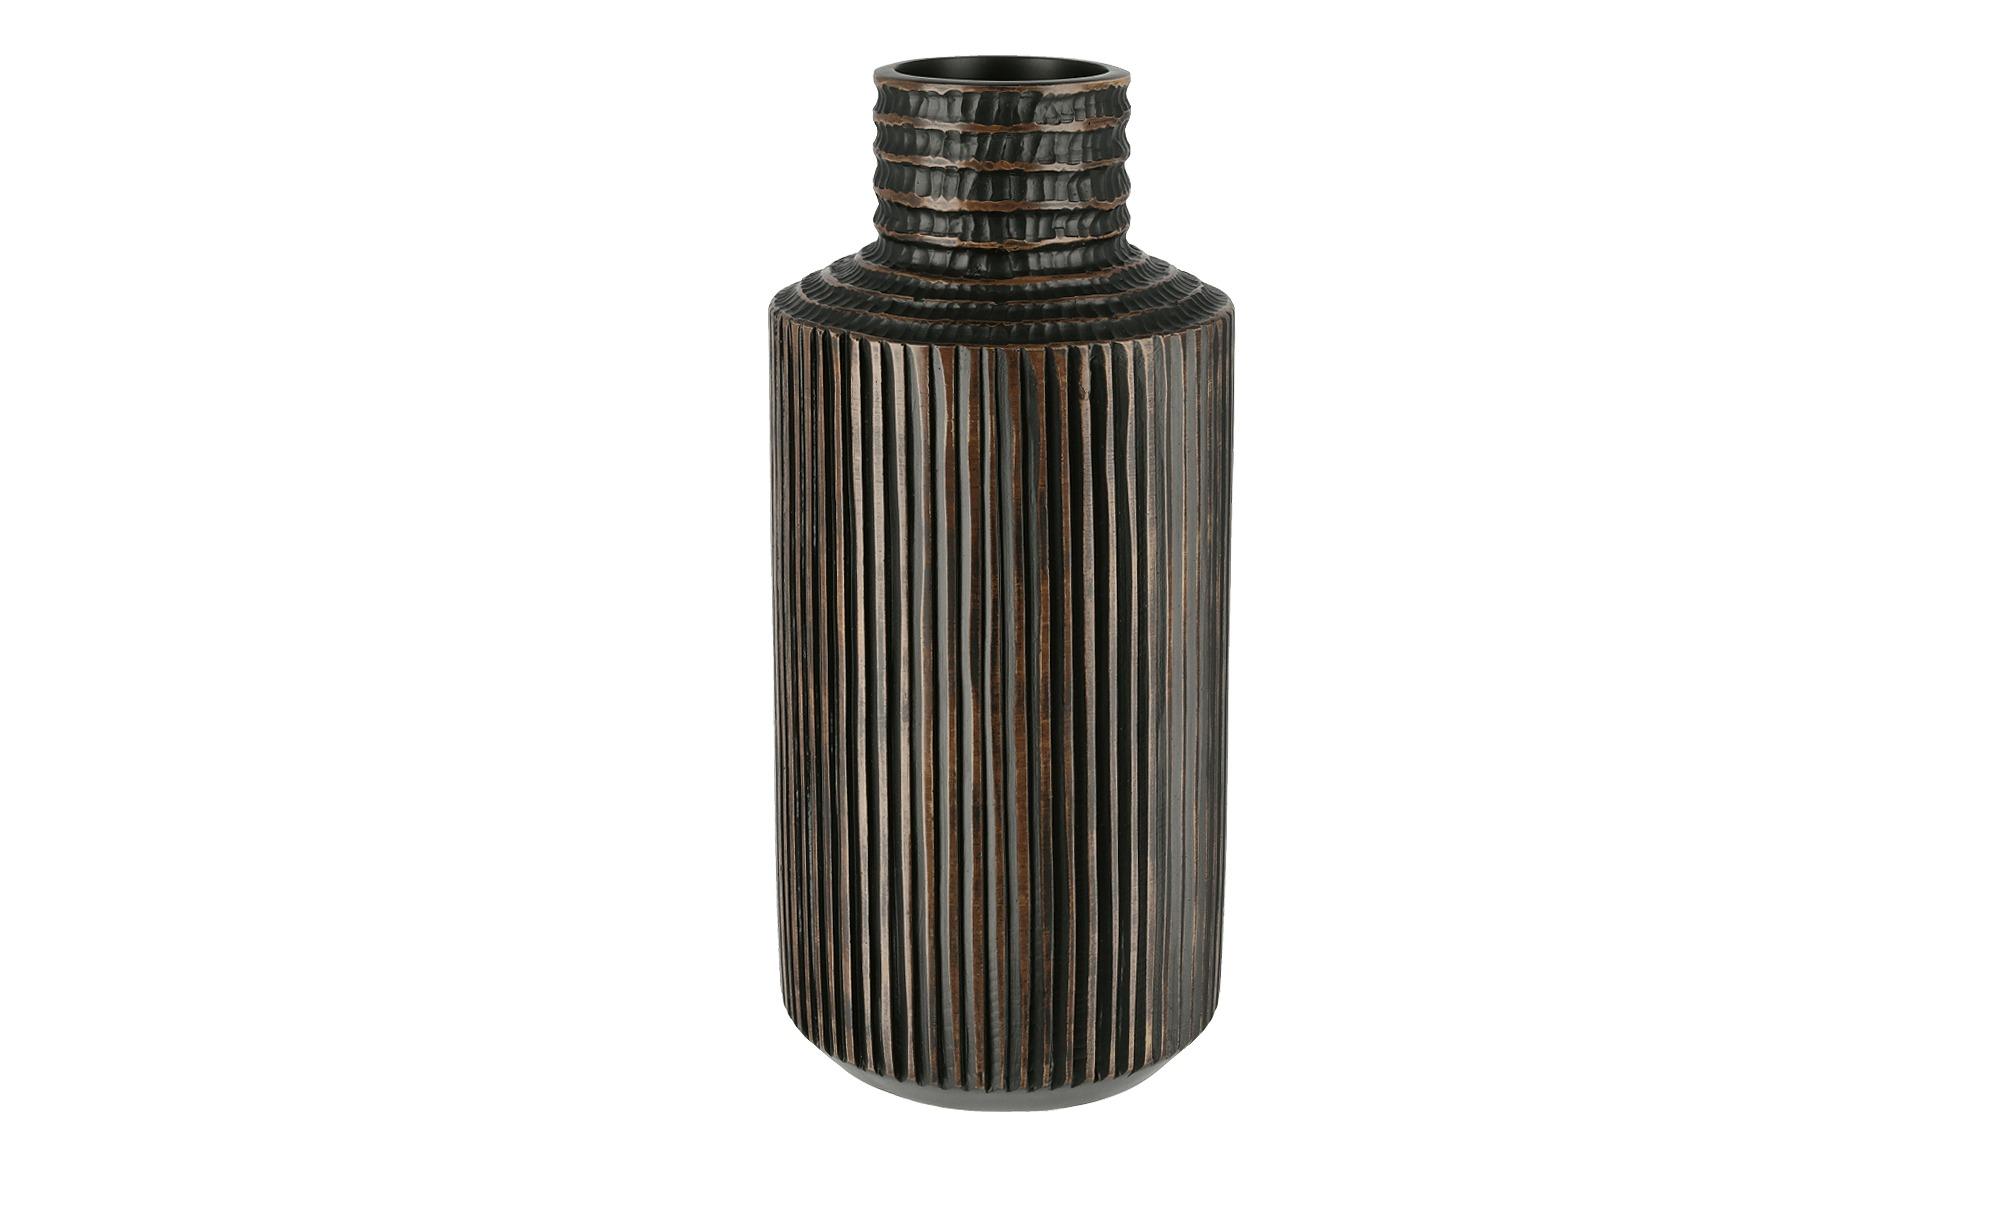 Vase ¦ braun ¦ Polyresin (Kunstharz)Ø: 16.5 Dekoration > Vasen - Höffner günstig online kaufen